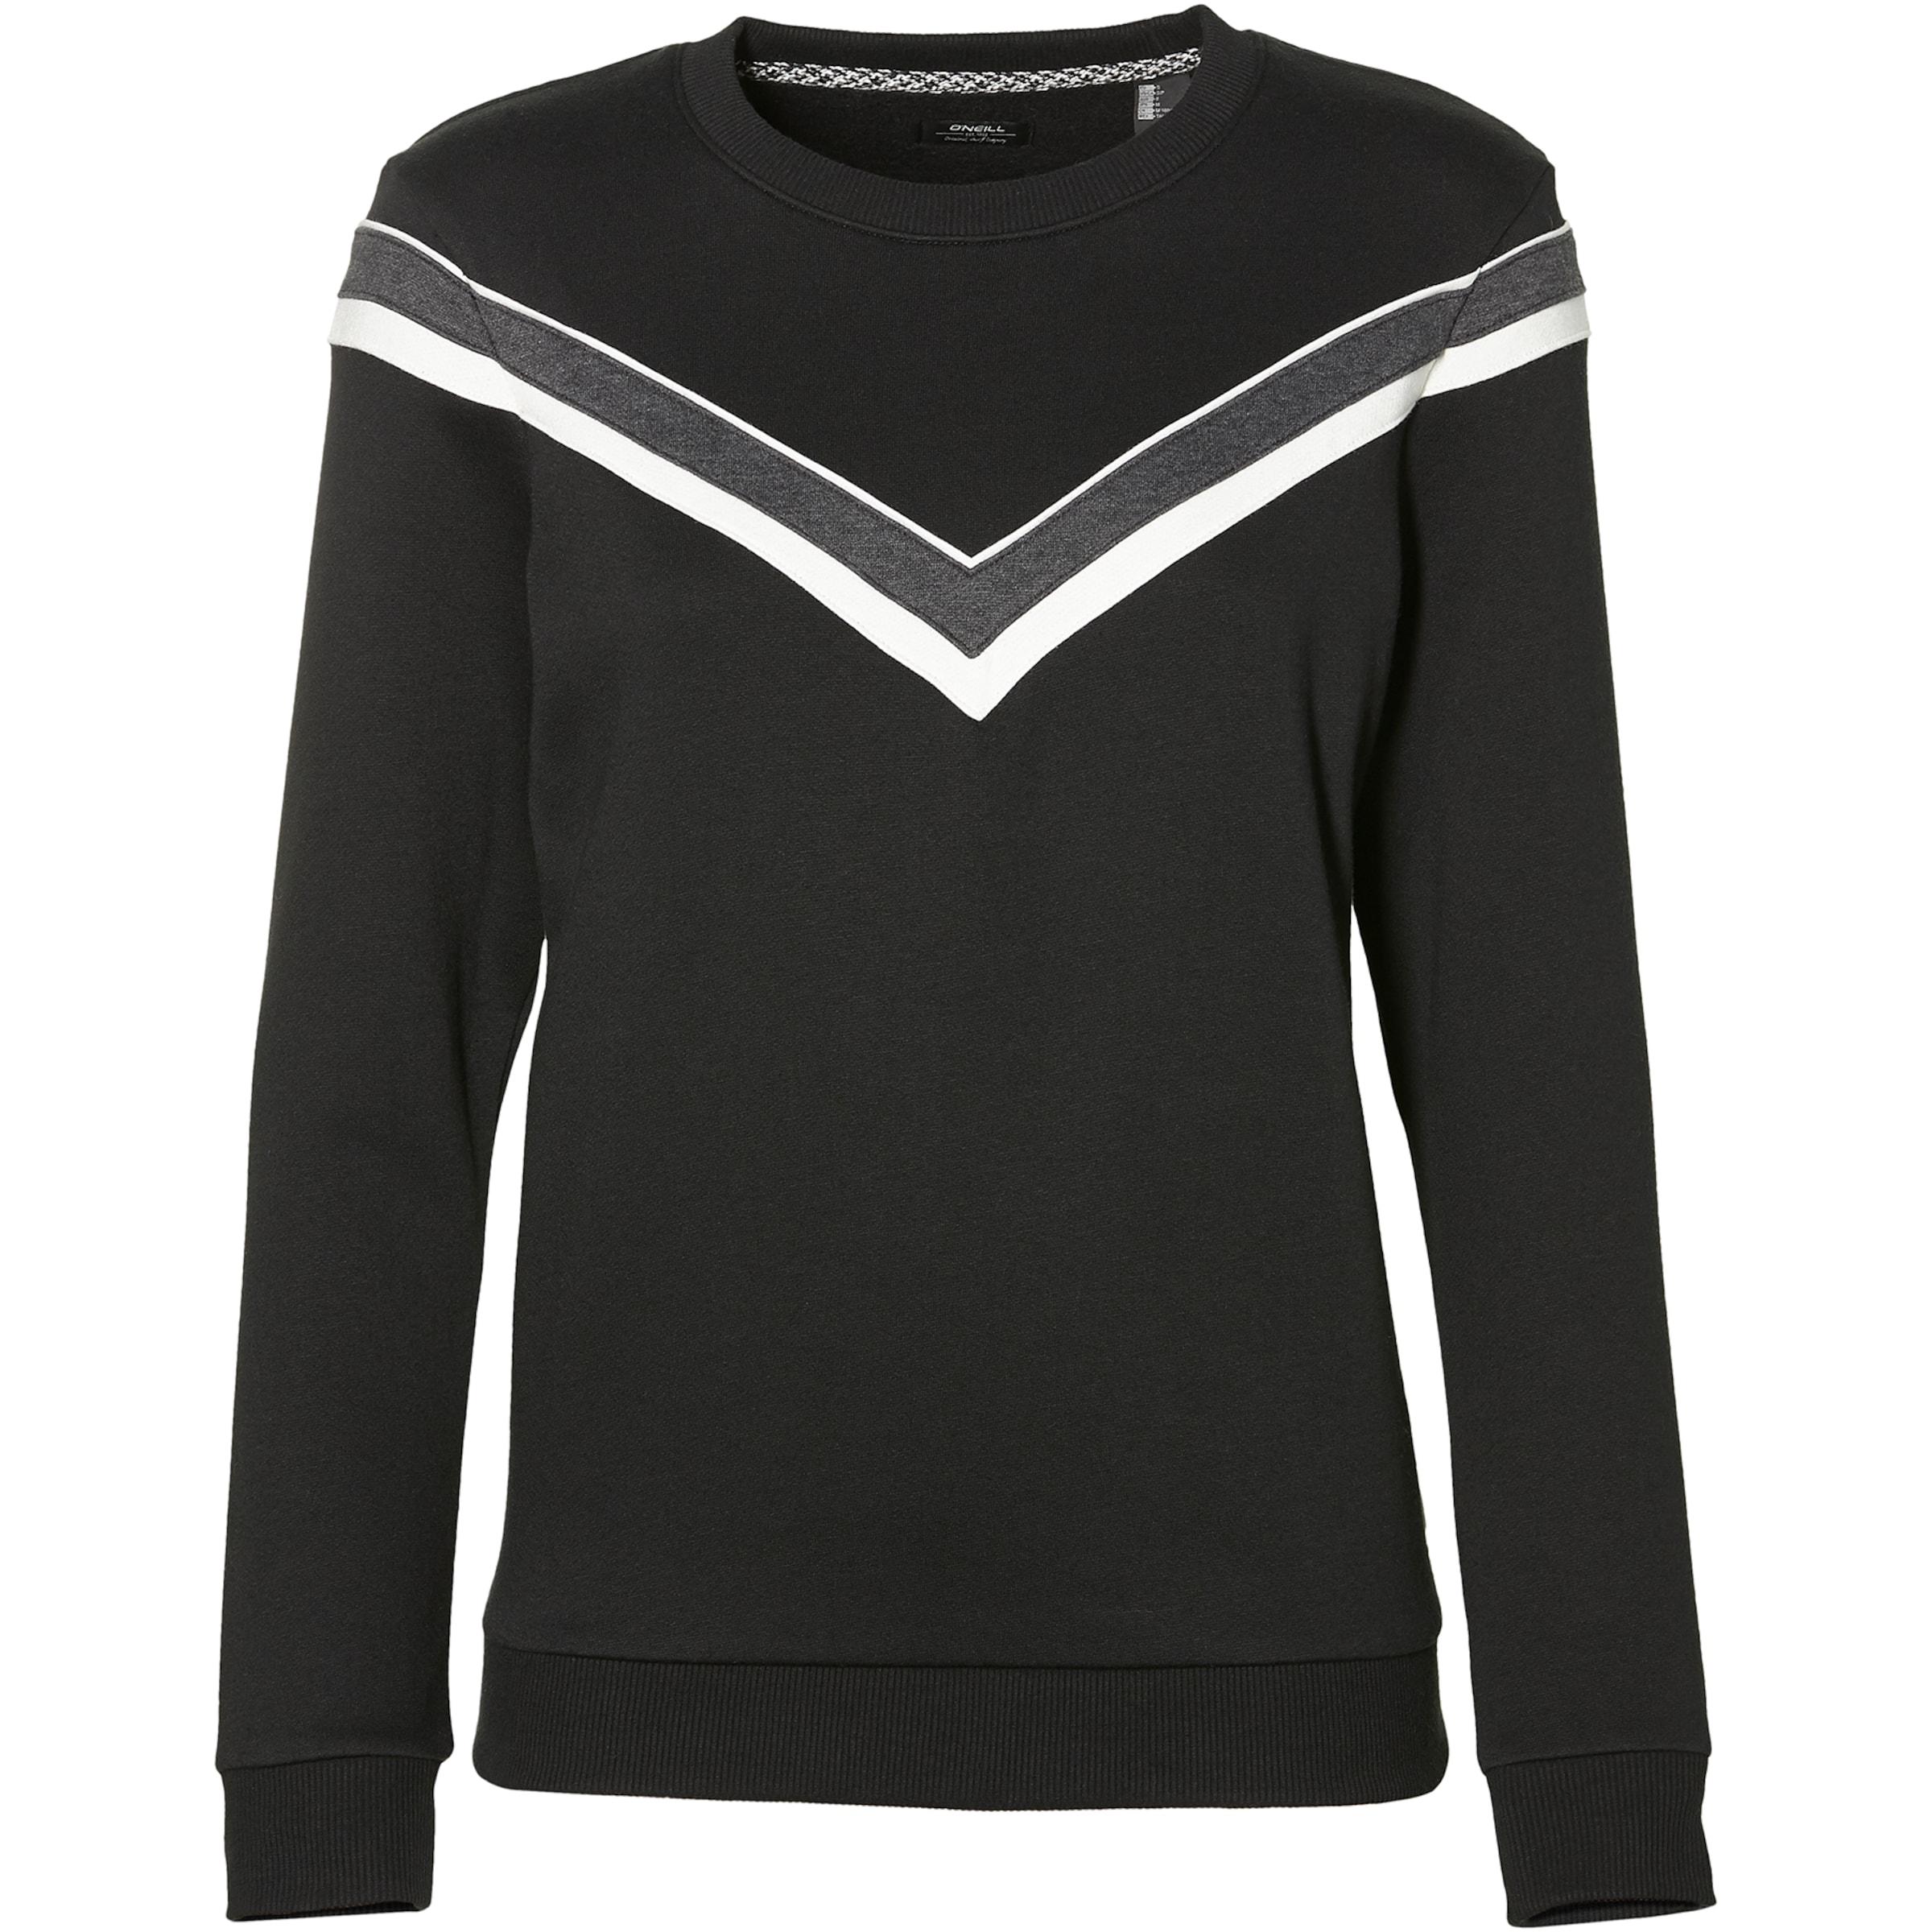 O'neill Sweatshirt Schwarz Sweatshirt O'neill In In O'neill Schwarz In Schwarz O'neill Sweatshirt nwO0kX8P